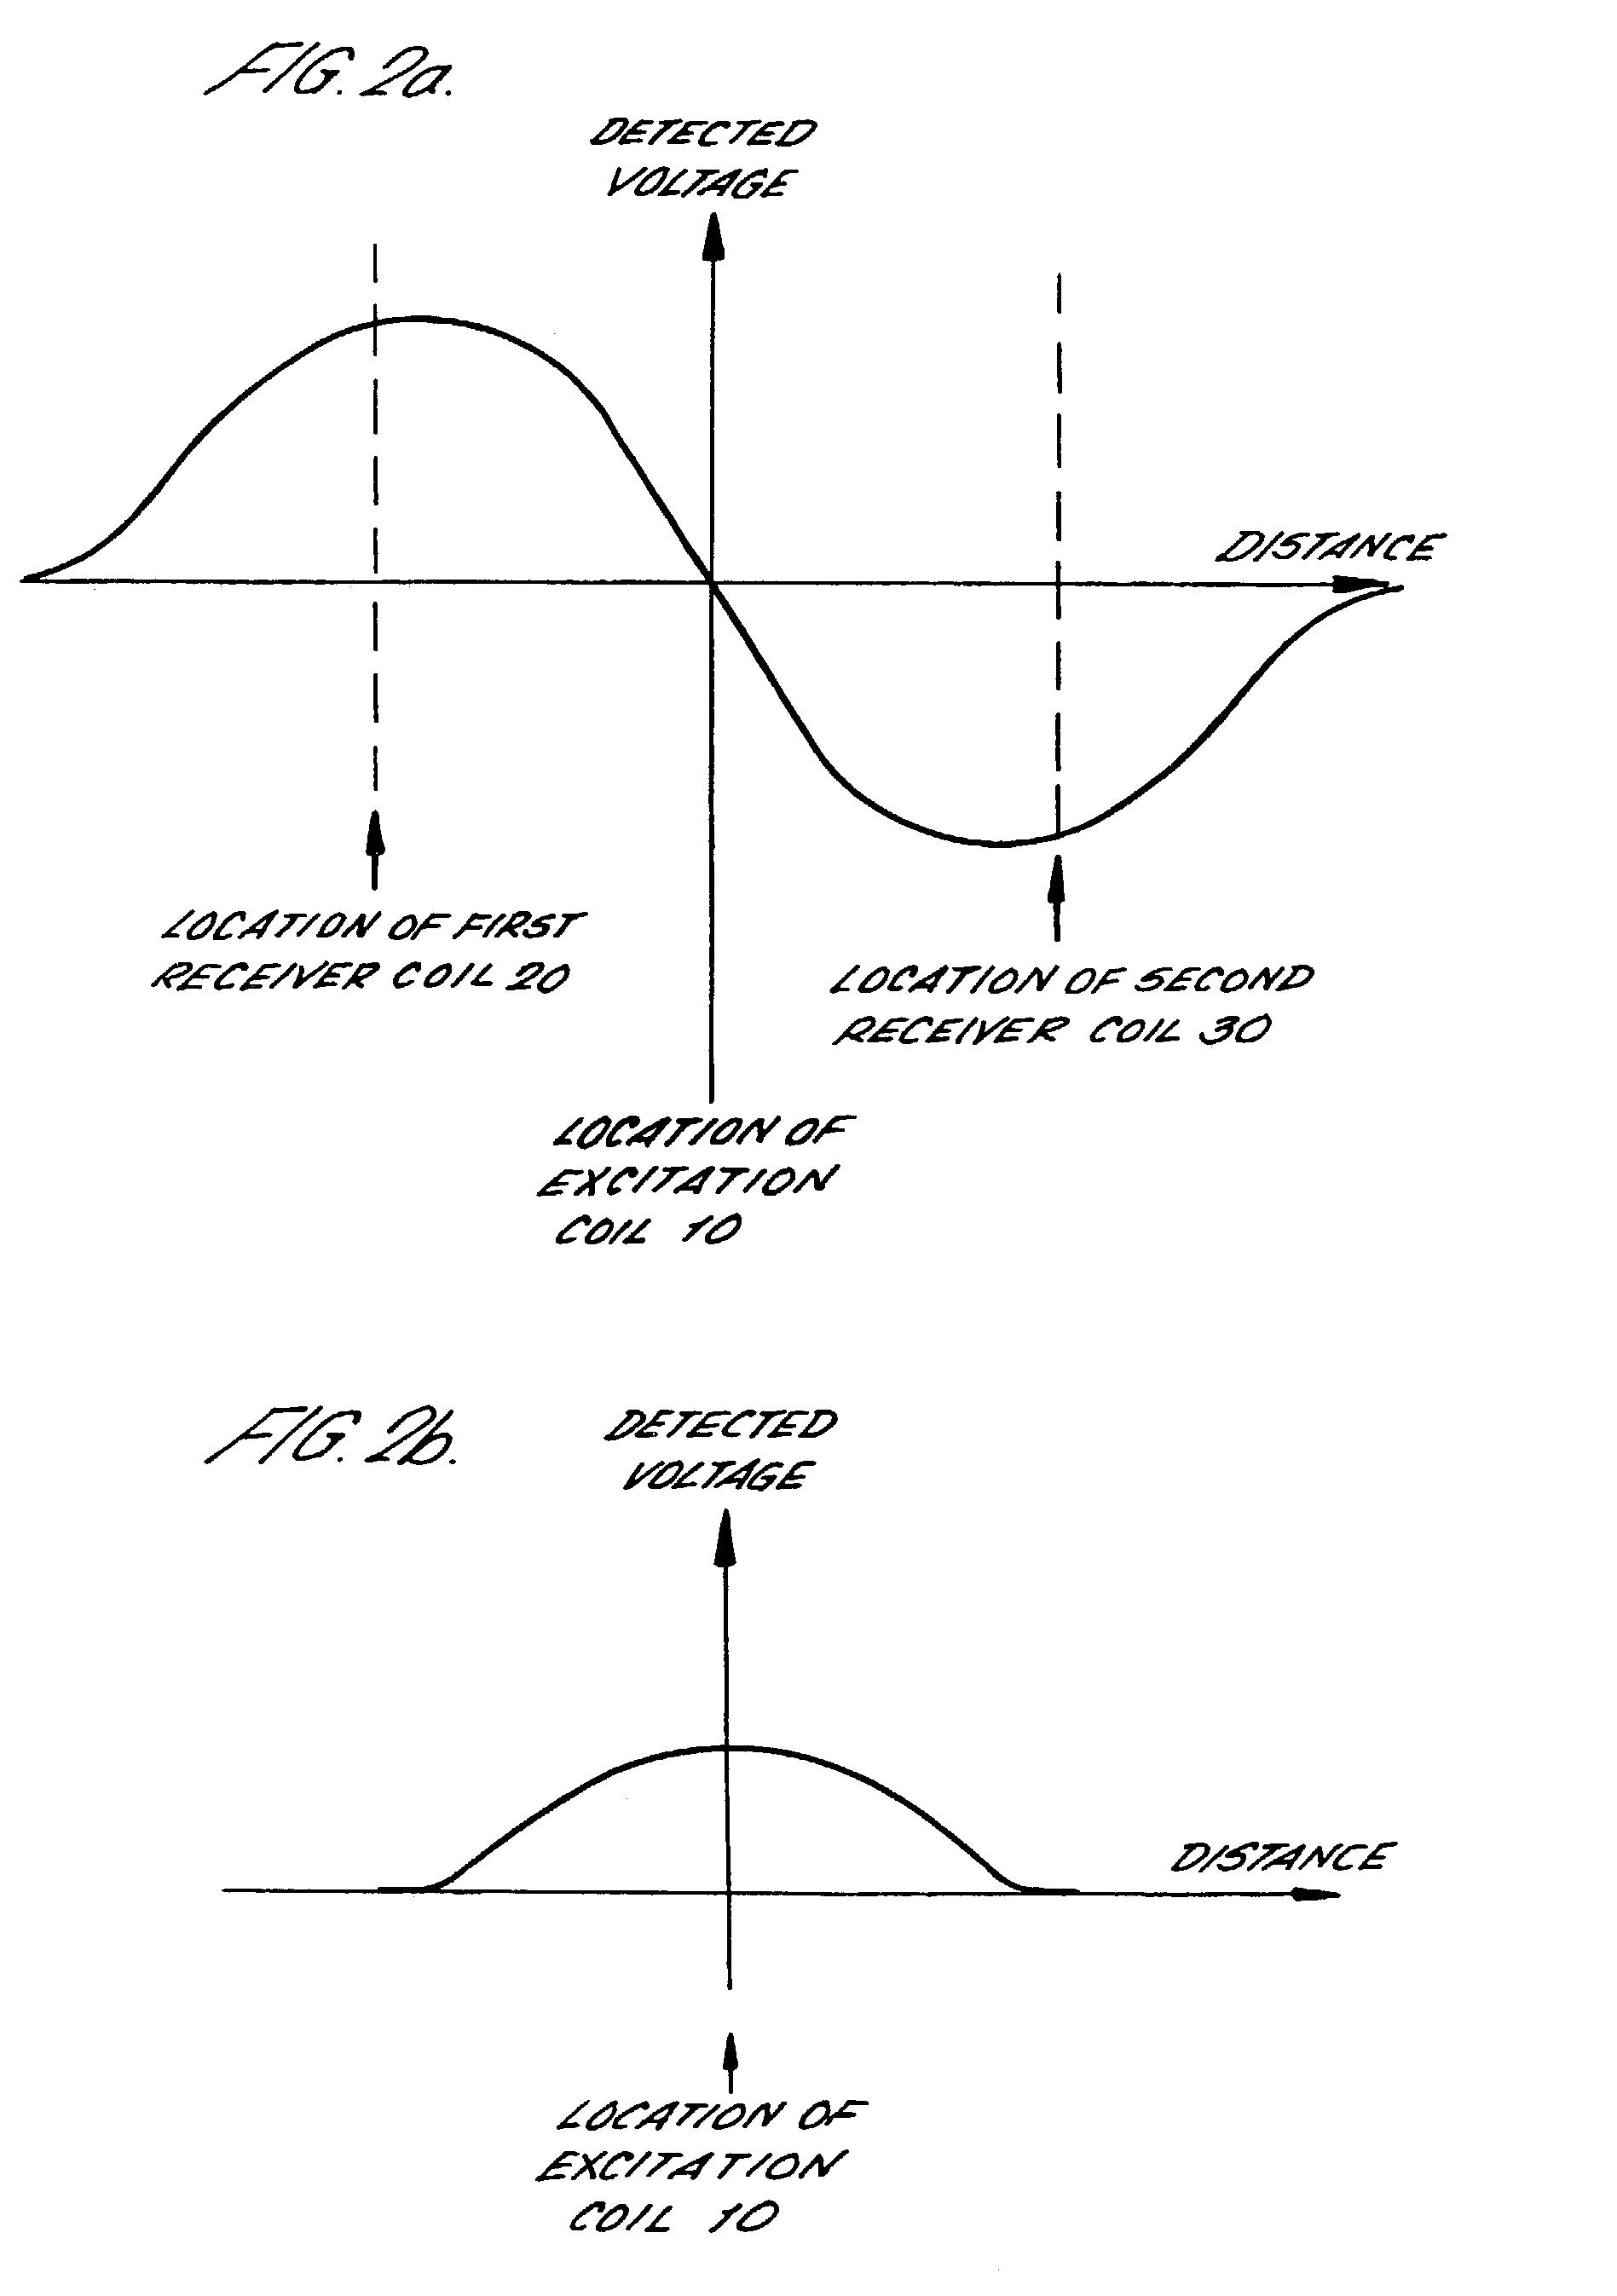 US07061236 20060613 D00002 patent us7061236 metal detector google patents safeline metal detector wiring diagram at mifinder.co